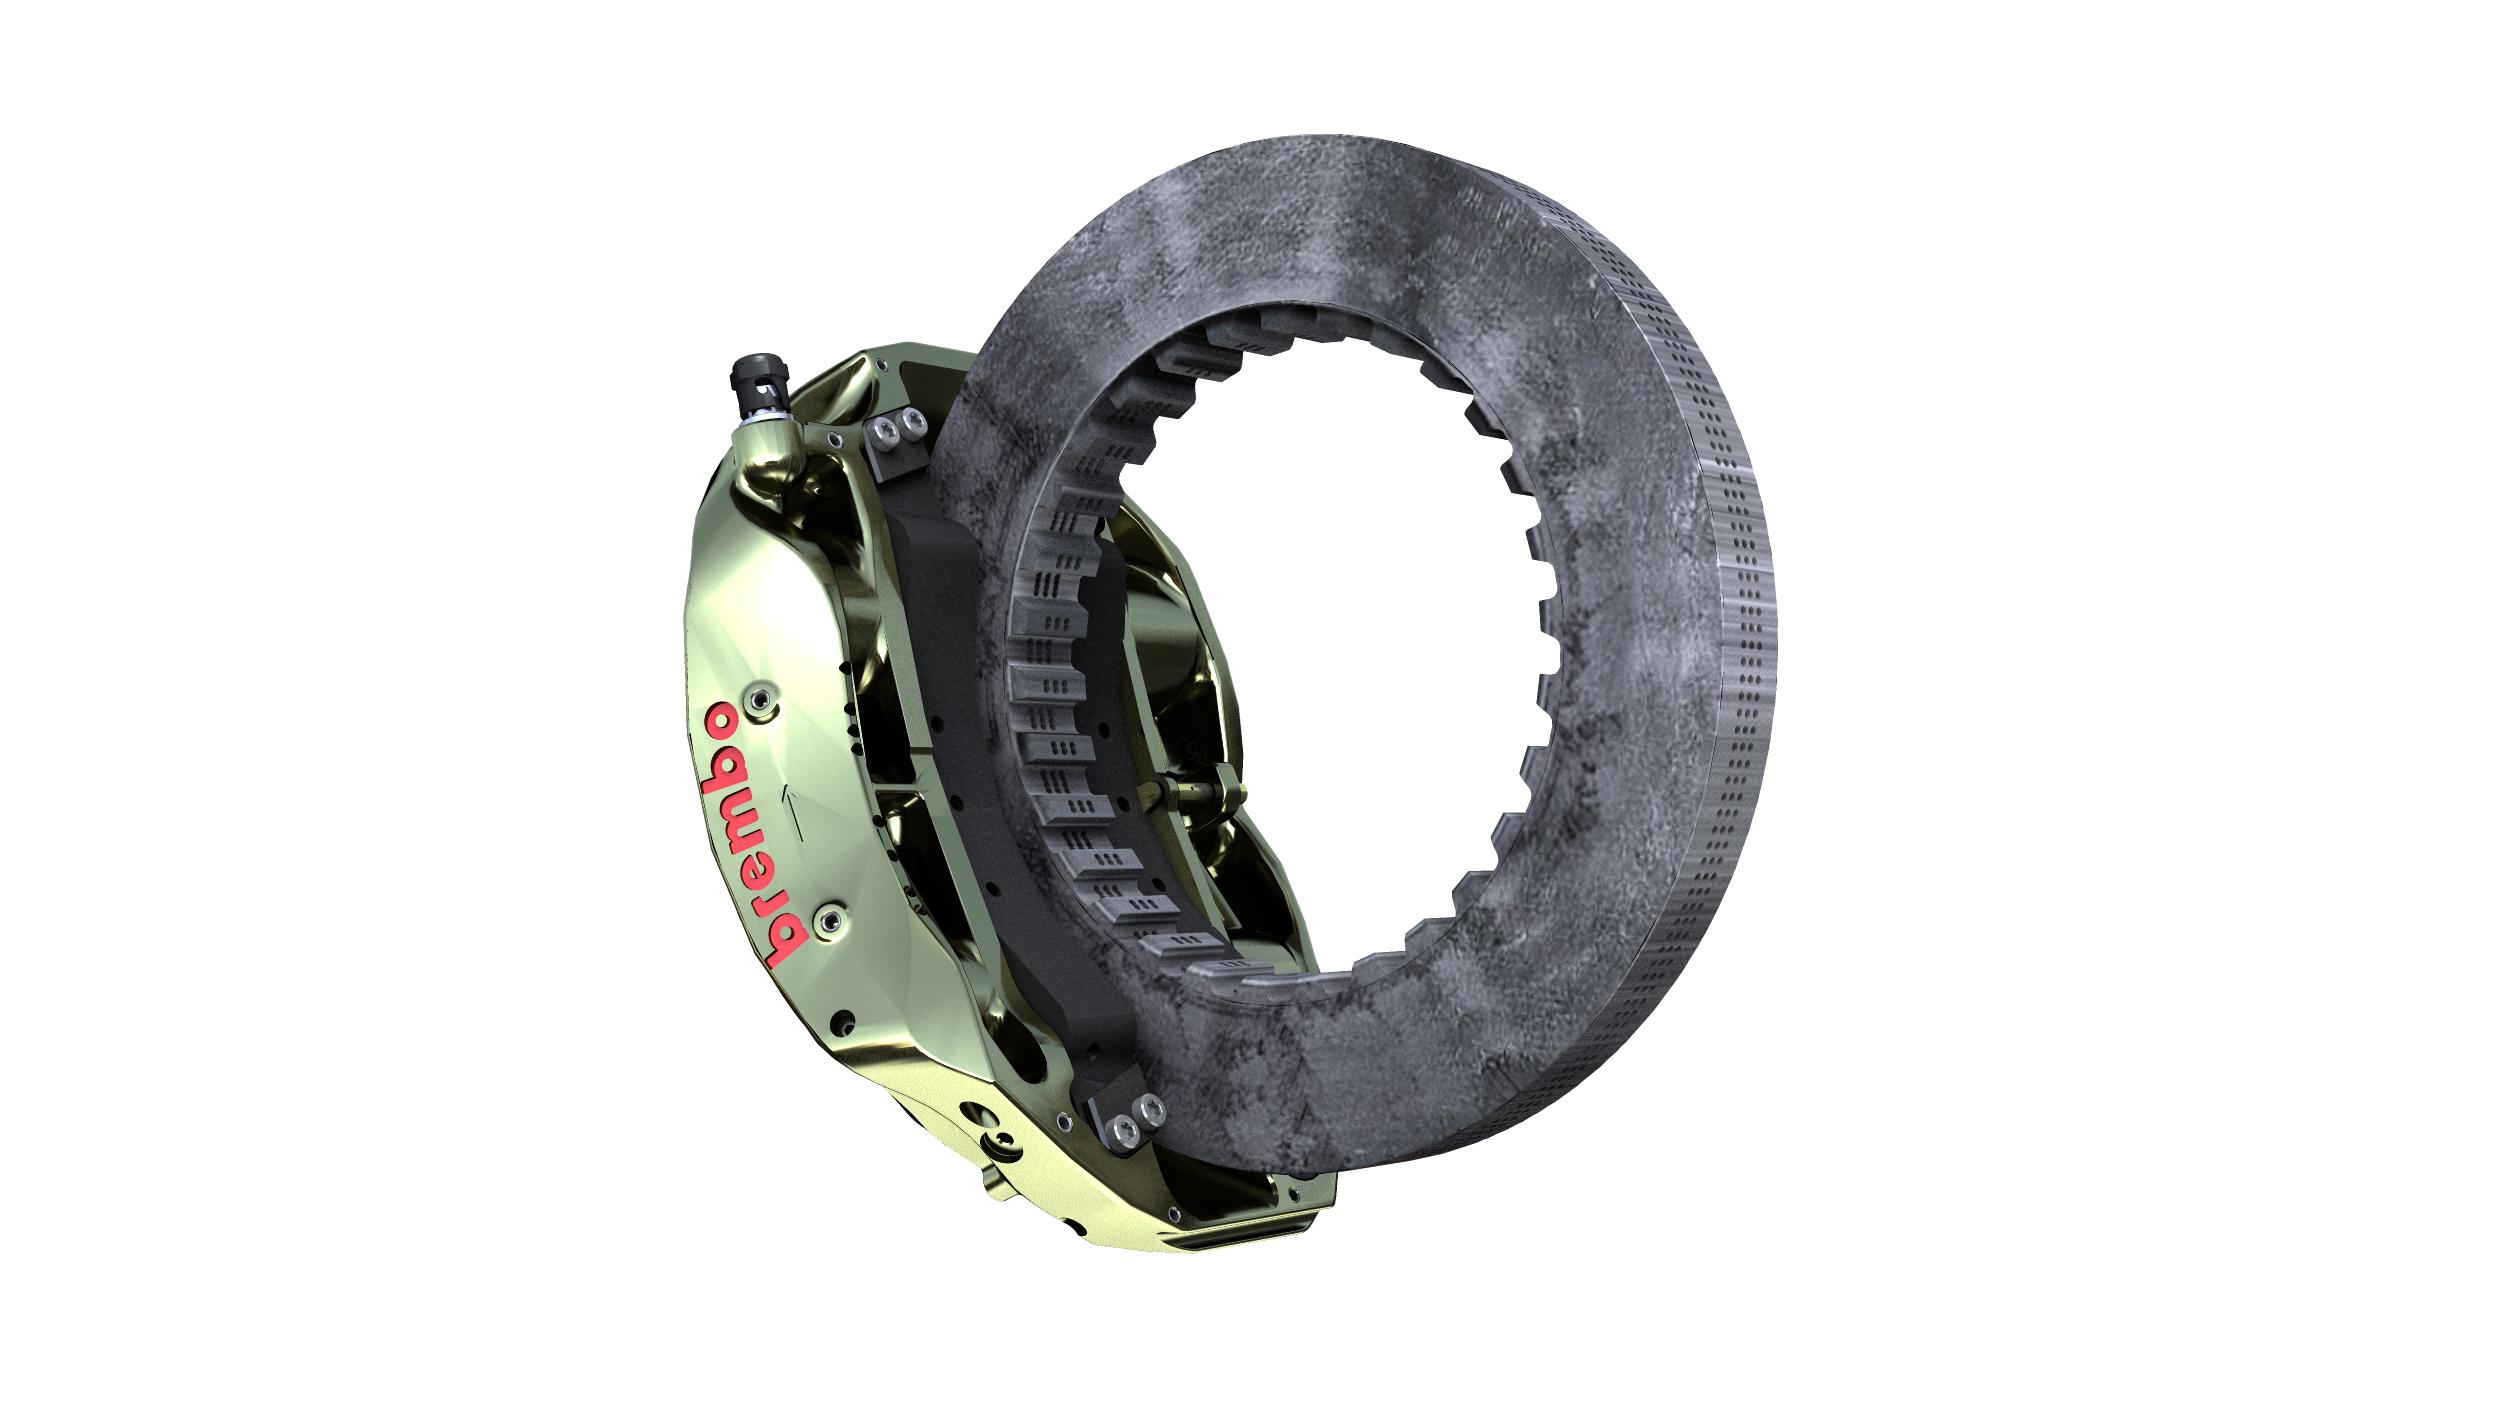 f1-brembo-braking-system-v1.jpg